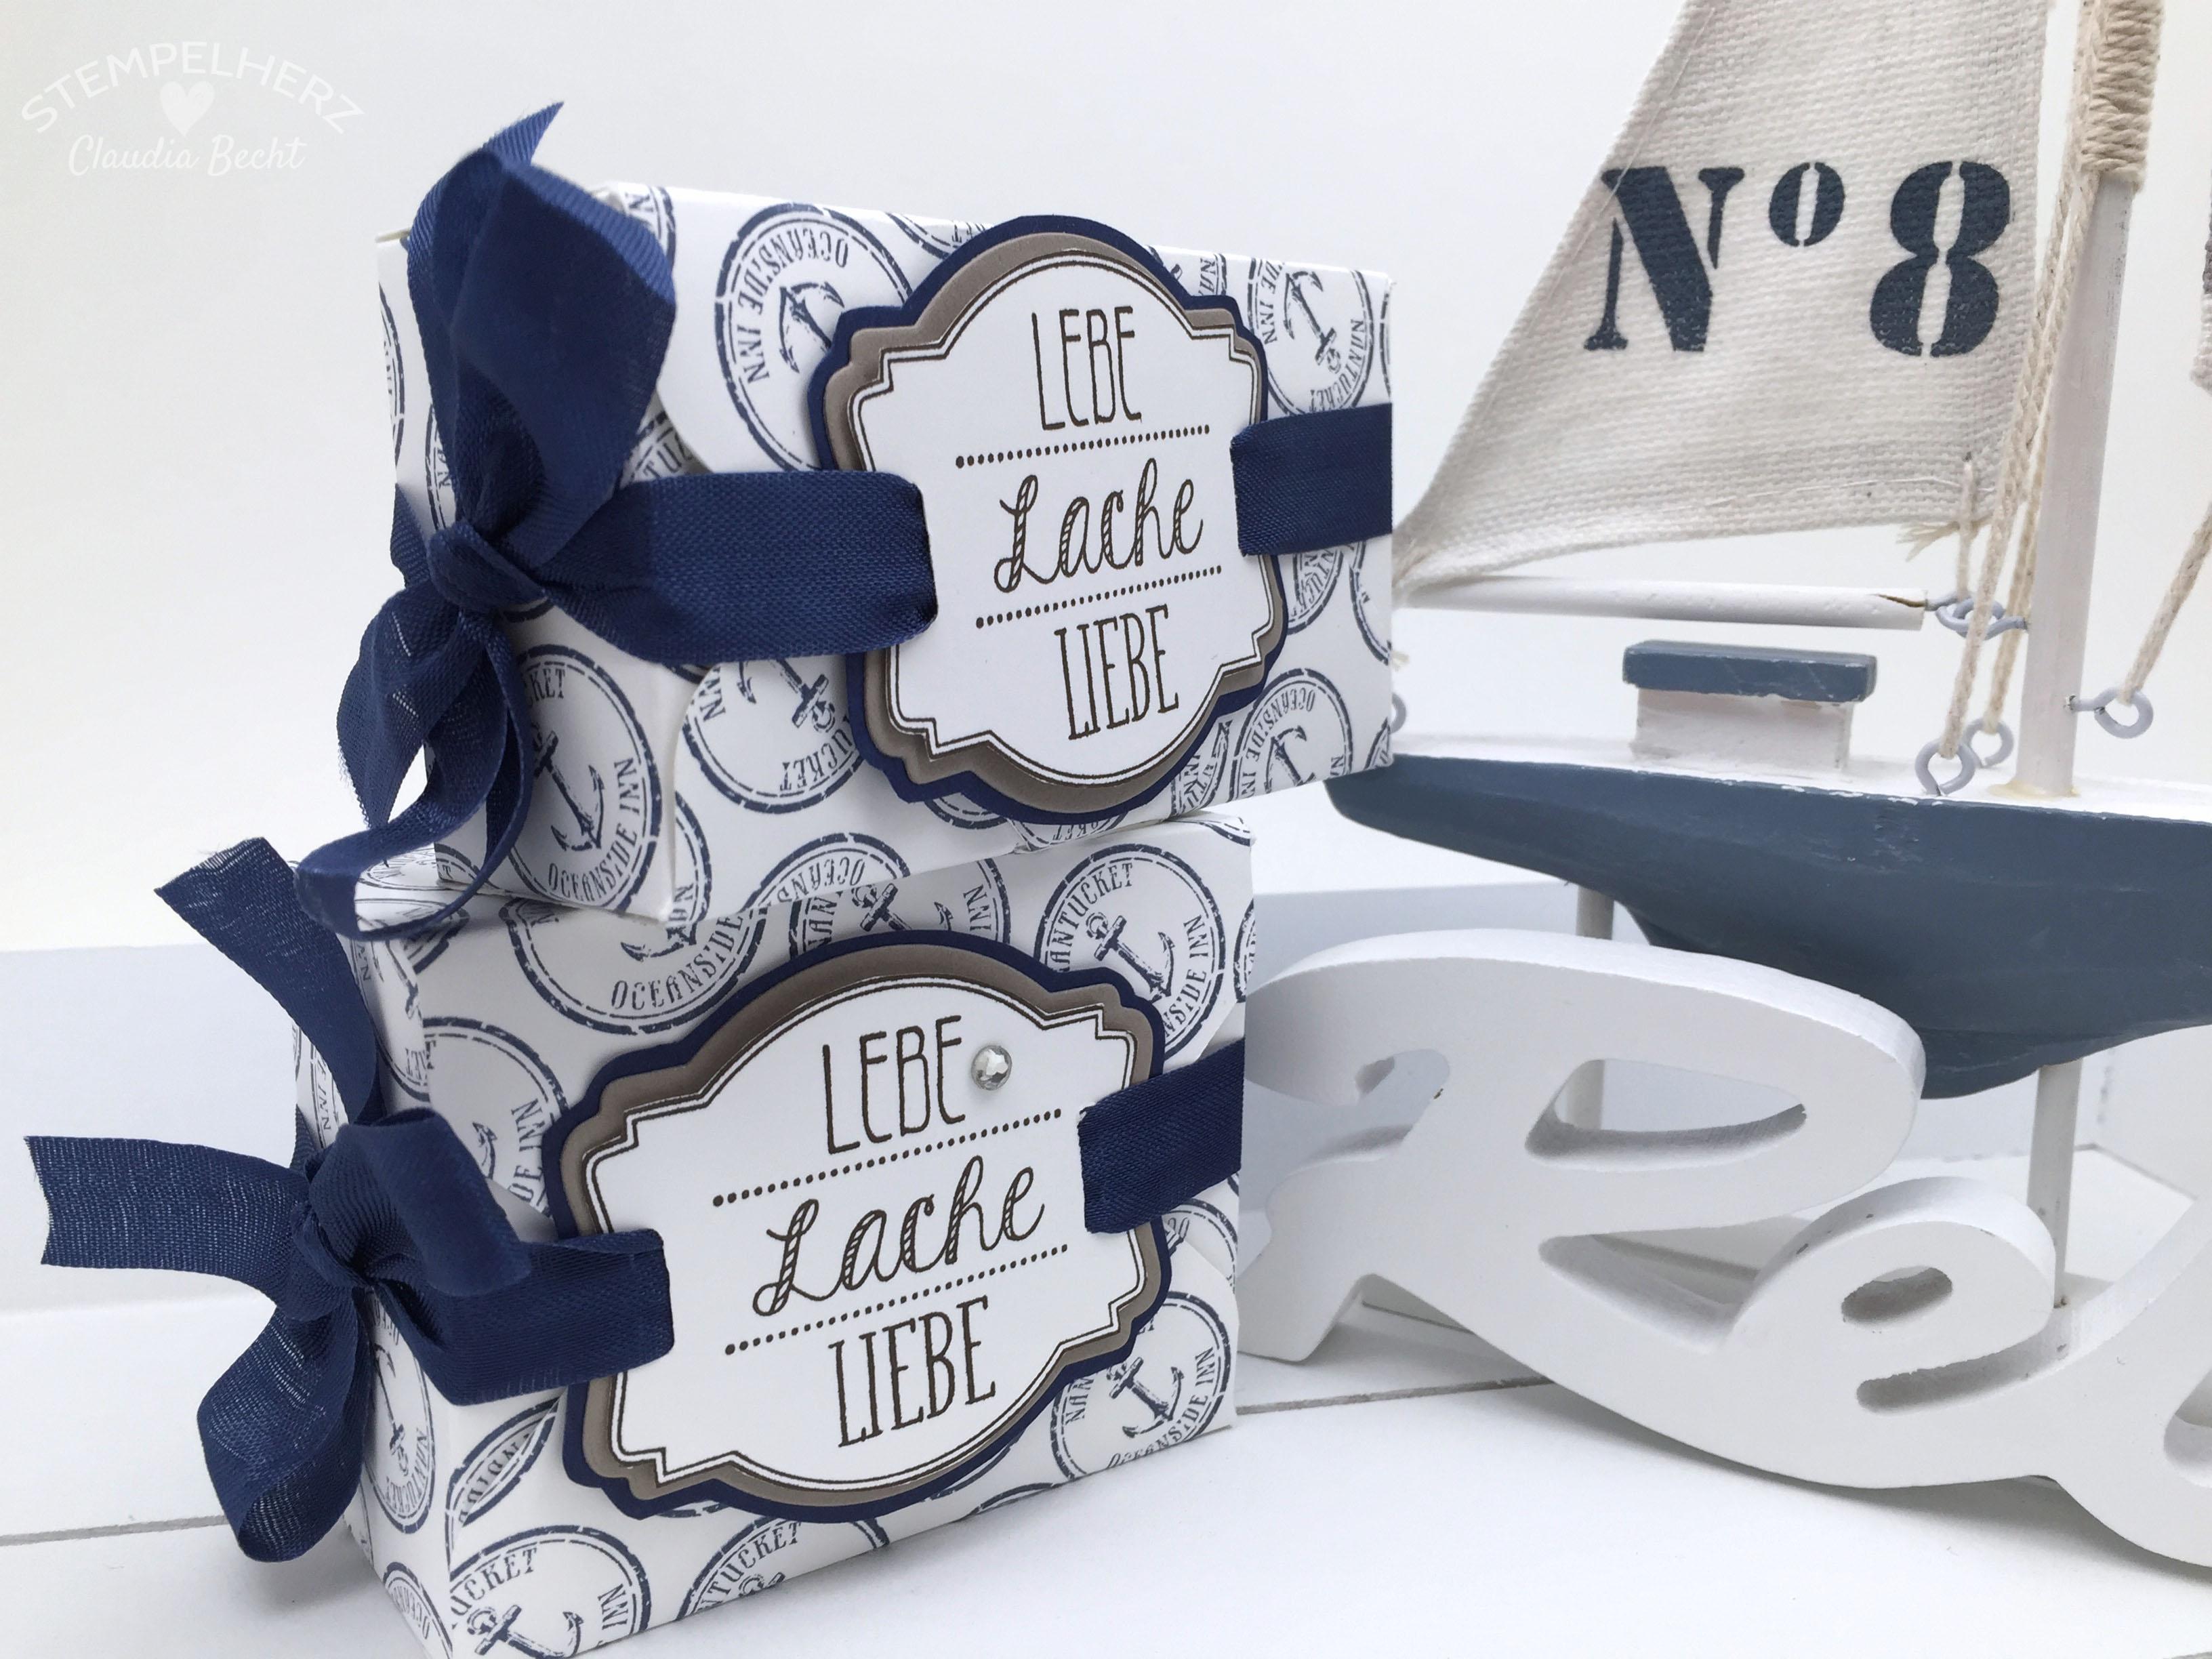 Stampin Up-Stempelherz-Boxen-Verpackung-Ach du meine Gruesse-By the Tide-Verpackung Lebe Lache Liebe 04